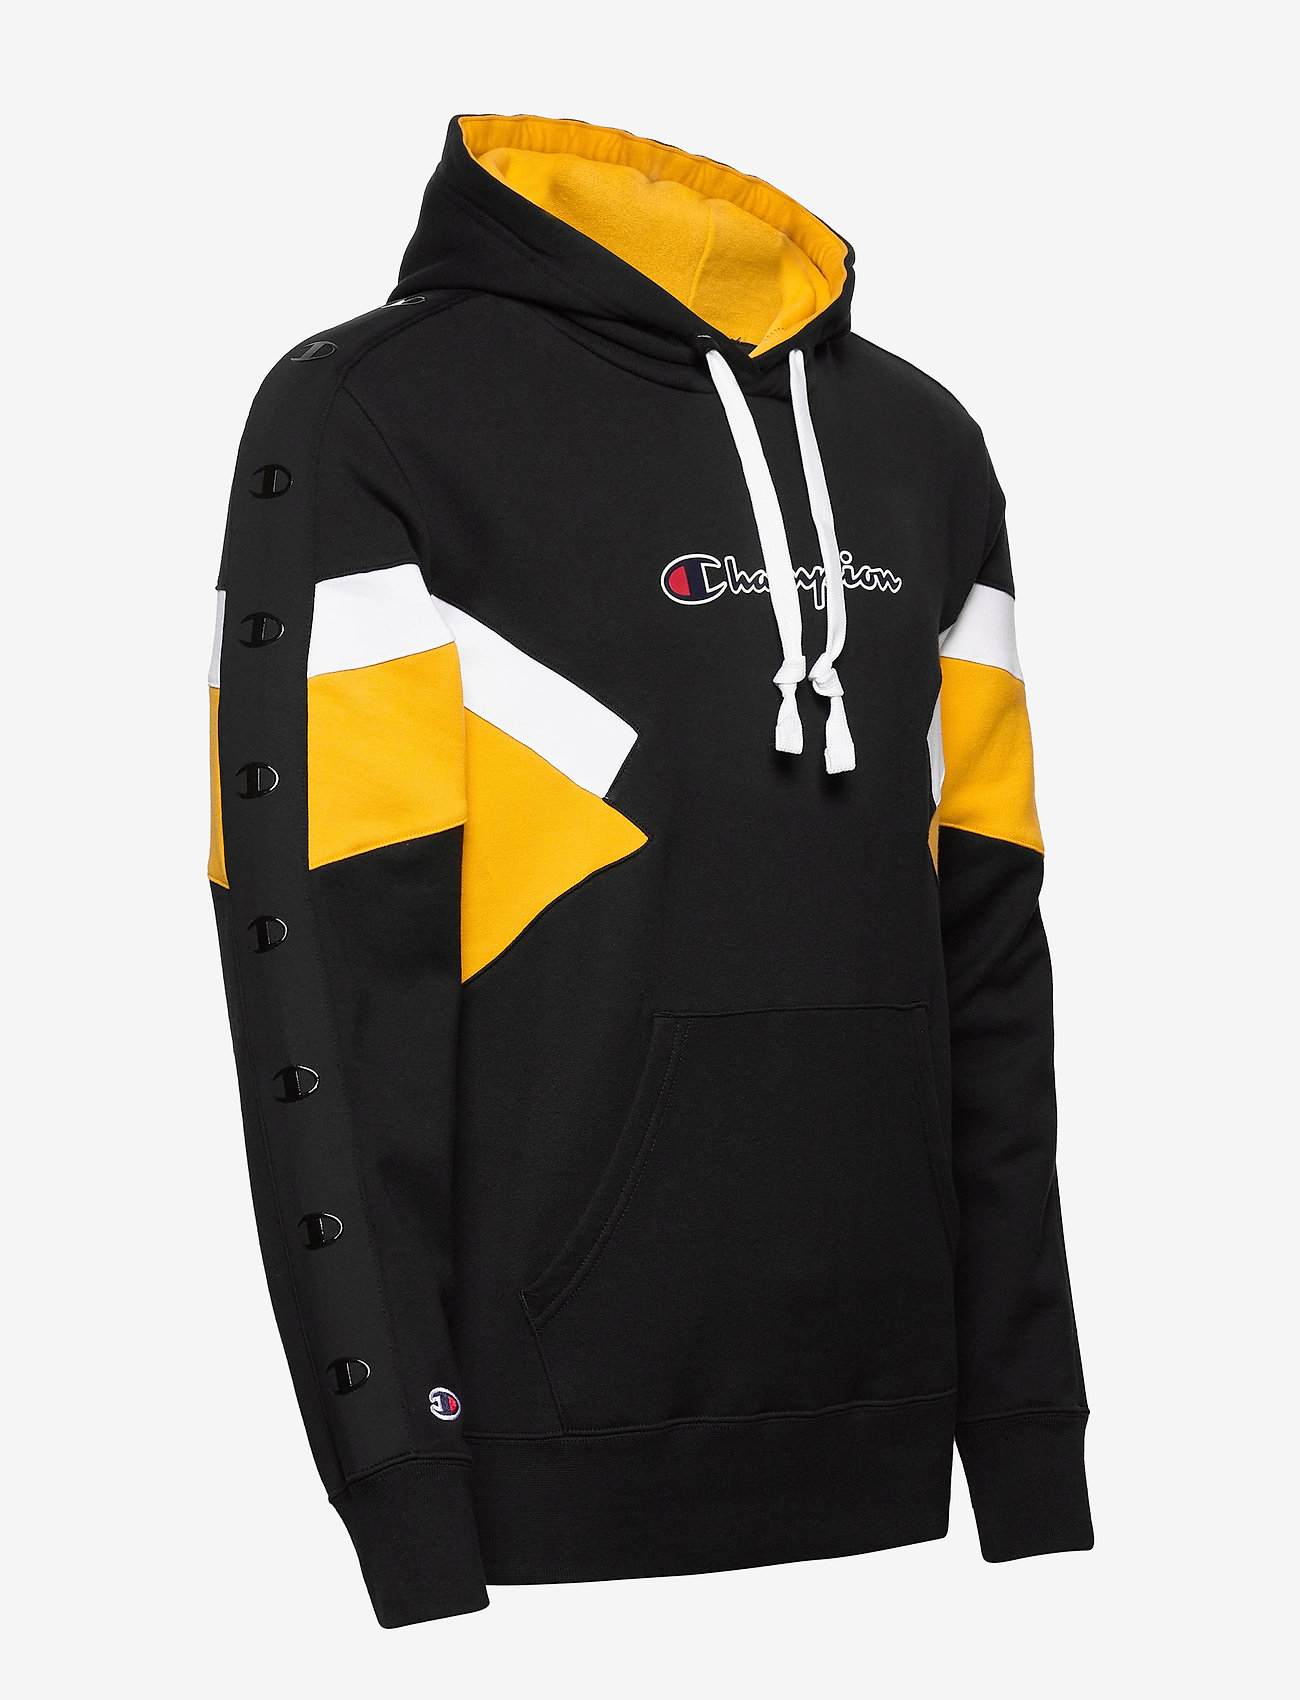 Hooded Sweatshirt (Black Beauty) (63.75 €) - Champion fELNi